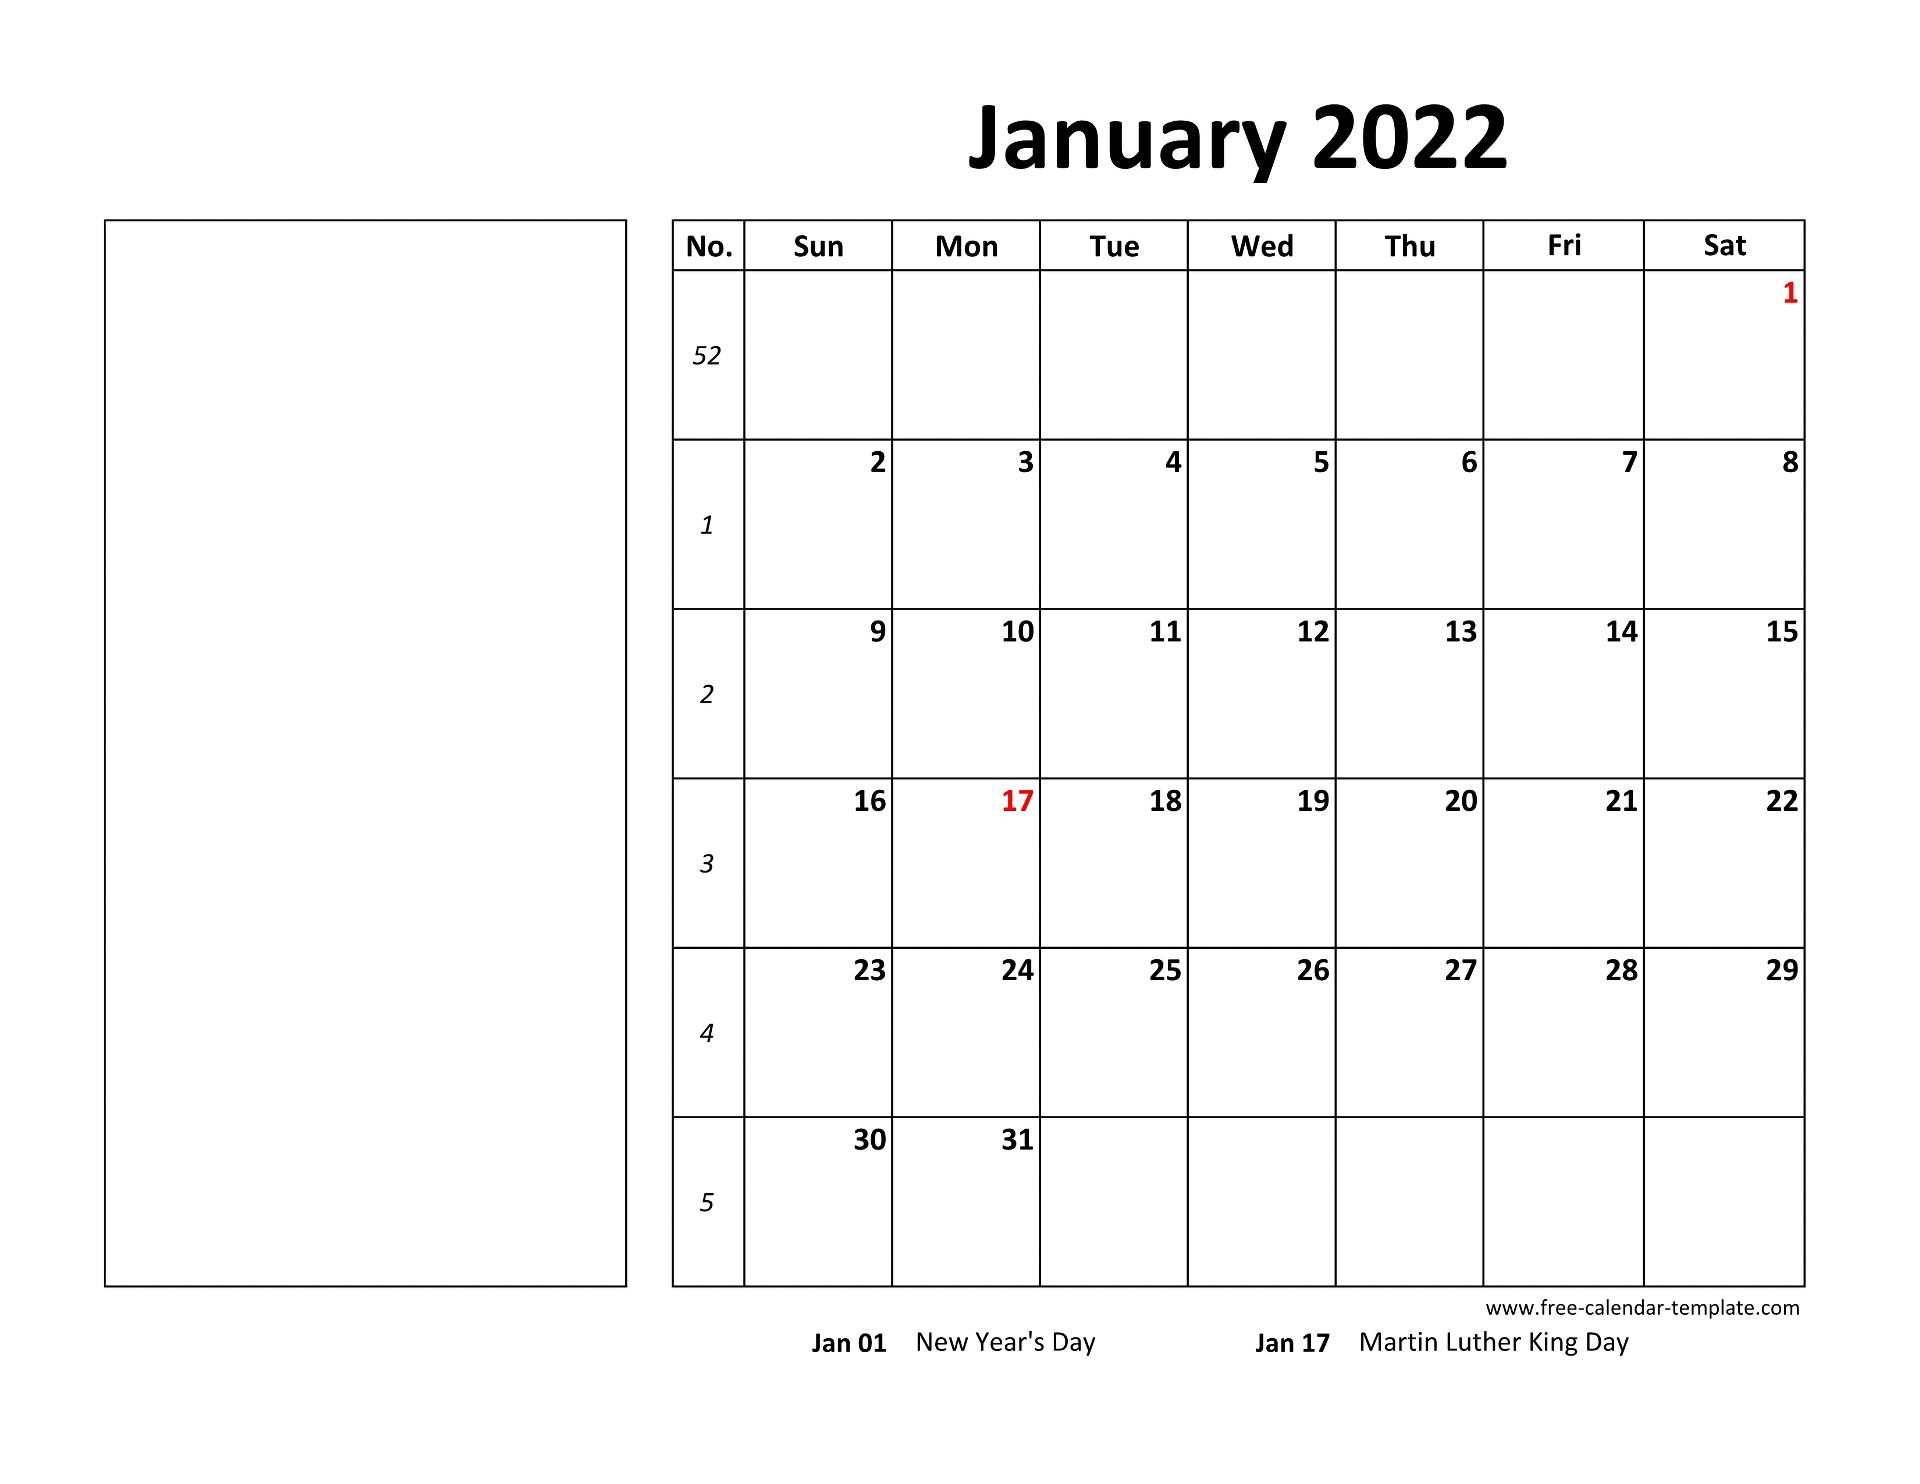 January 2022 Free Calendar Tempplate | Free-calendar ...